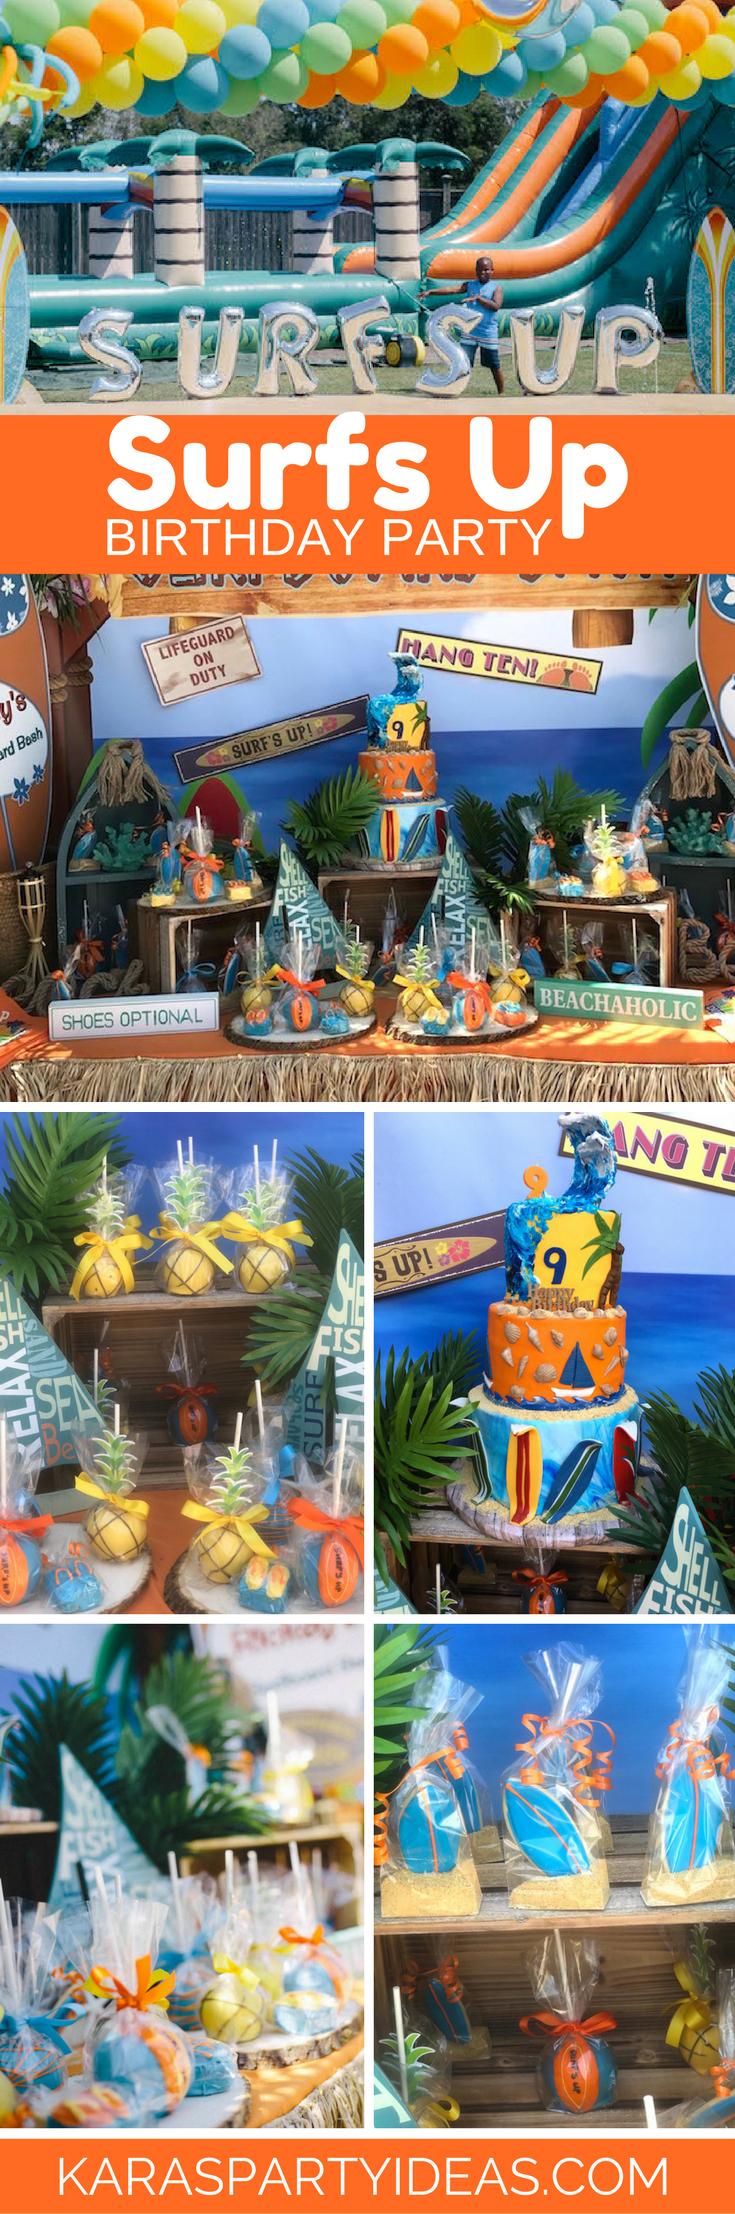 Surfs Up Birthday Party via Kara's Party Ideas - KarasPartyIdeas.com